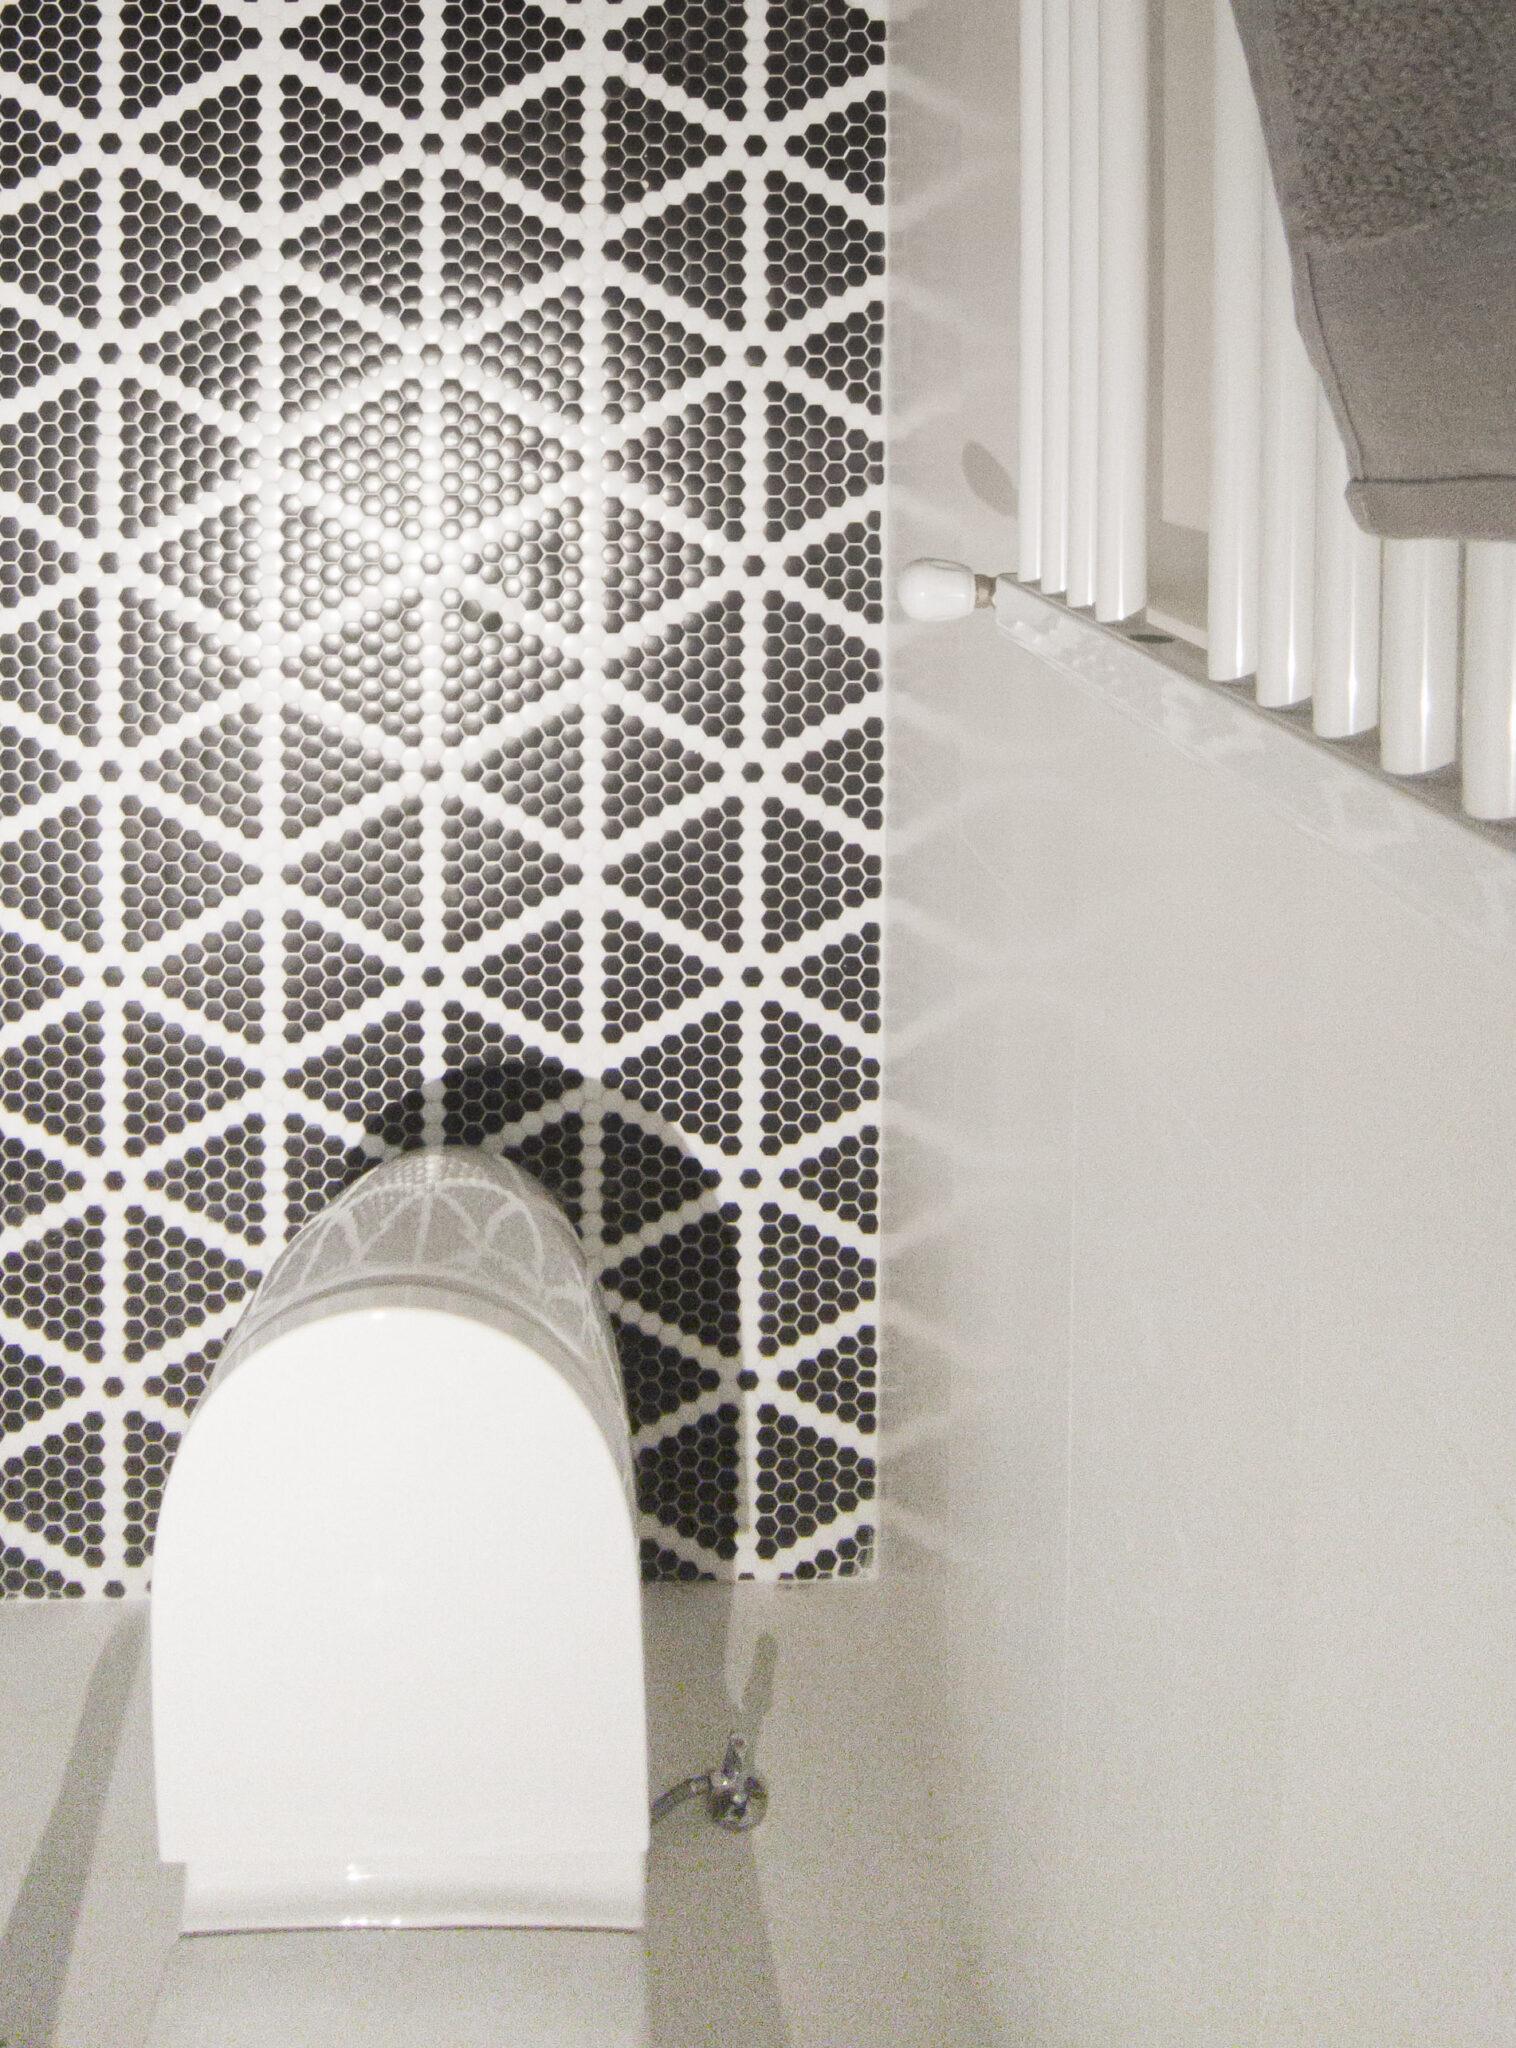 Proyecto-hisbalit-Baño adaptado con suelo Sonata | Ducha | Black & White-baNo sonata black white hotel arimune baNo adaptado 5